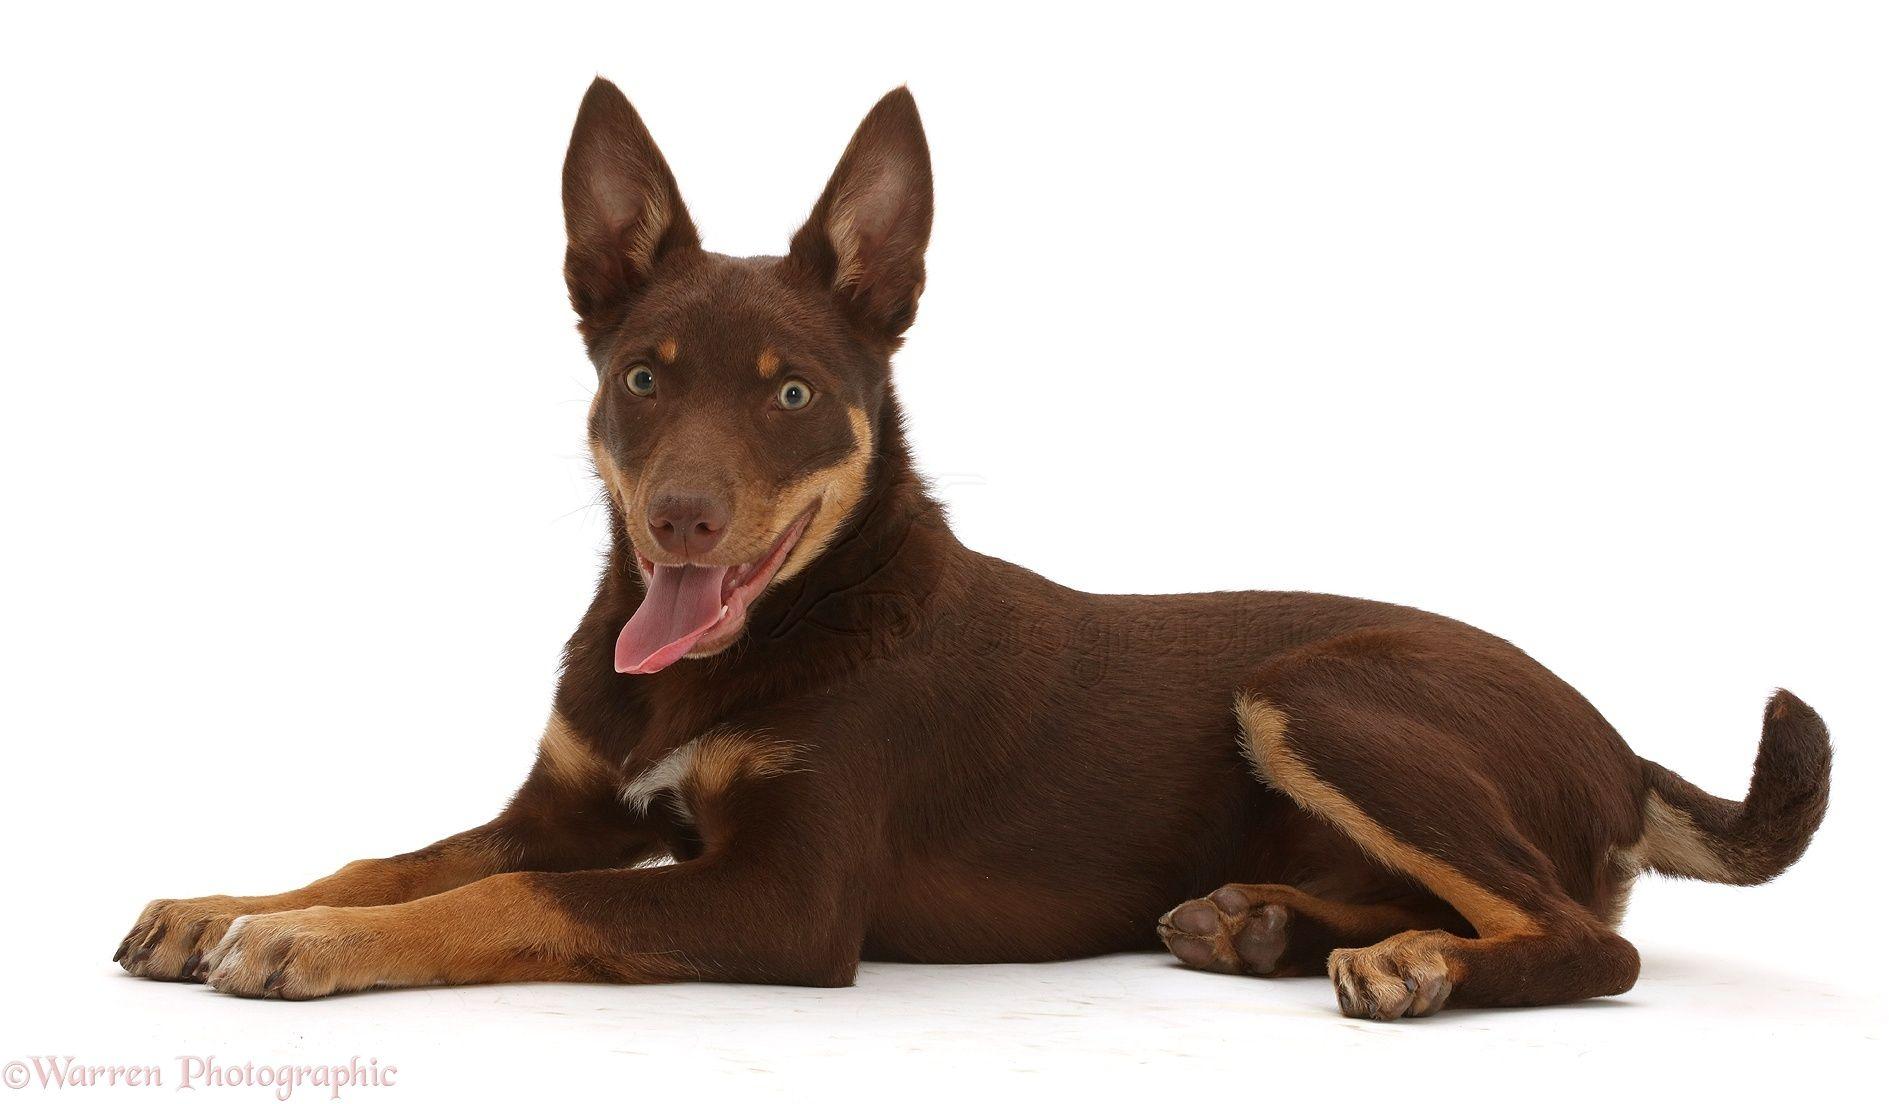 Pup Toys For Australian Kelpie Australian Kelpie Dog Ball Dogs